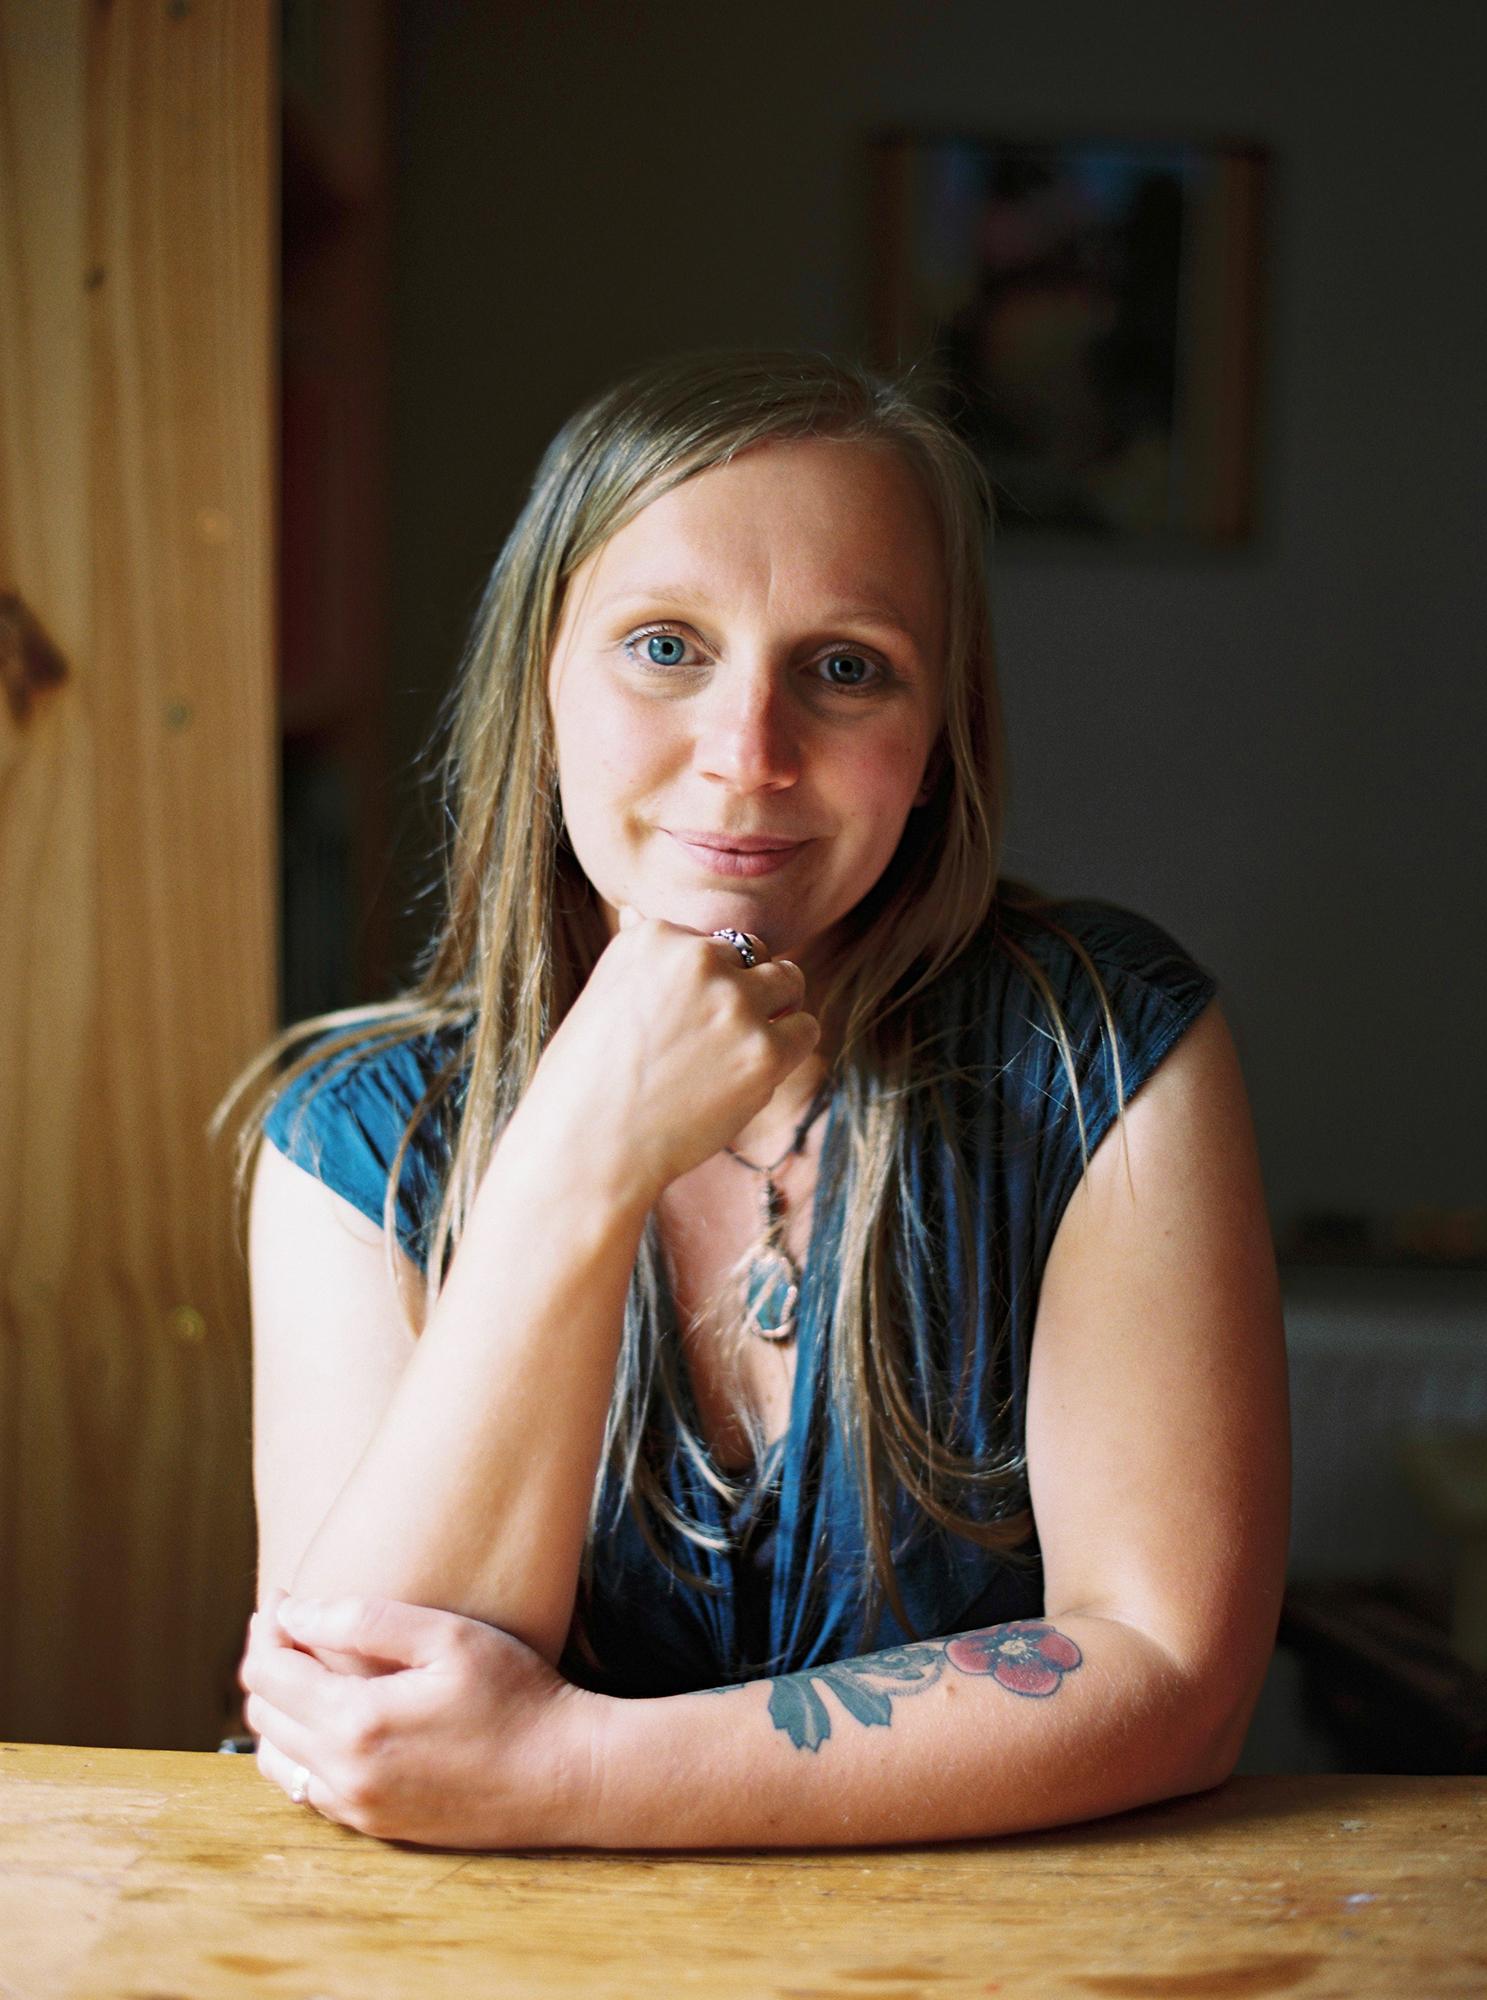 Wild Moor Alchemy |Cumbria - Anna is a wonderful flower essence practitioner who also makes her own bespoke essences.